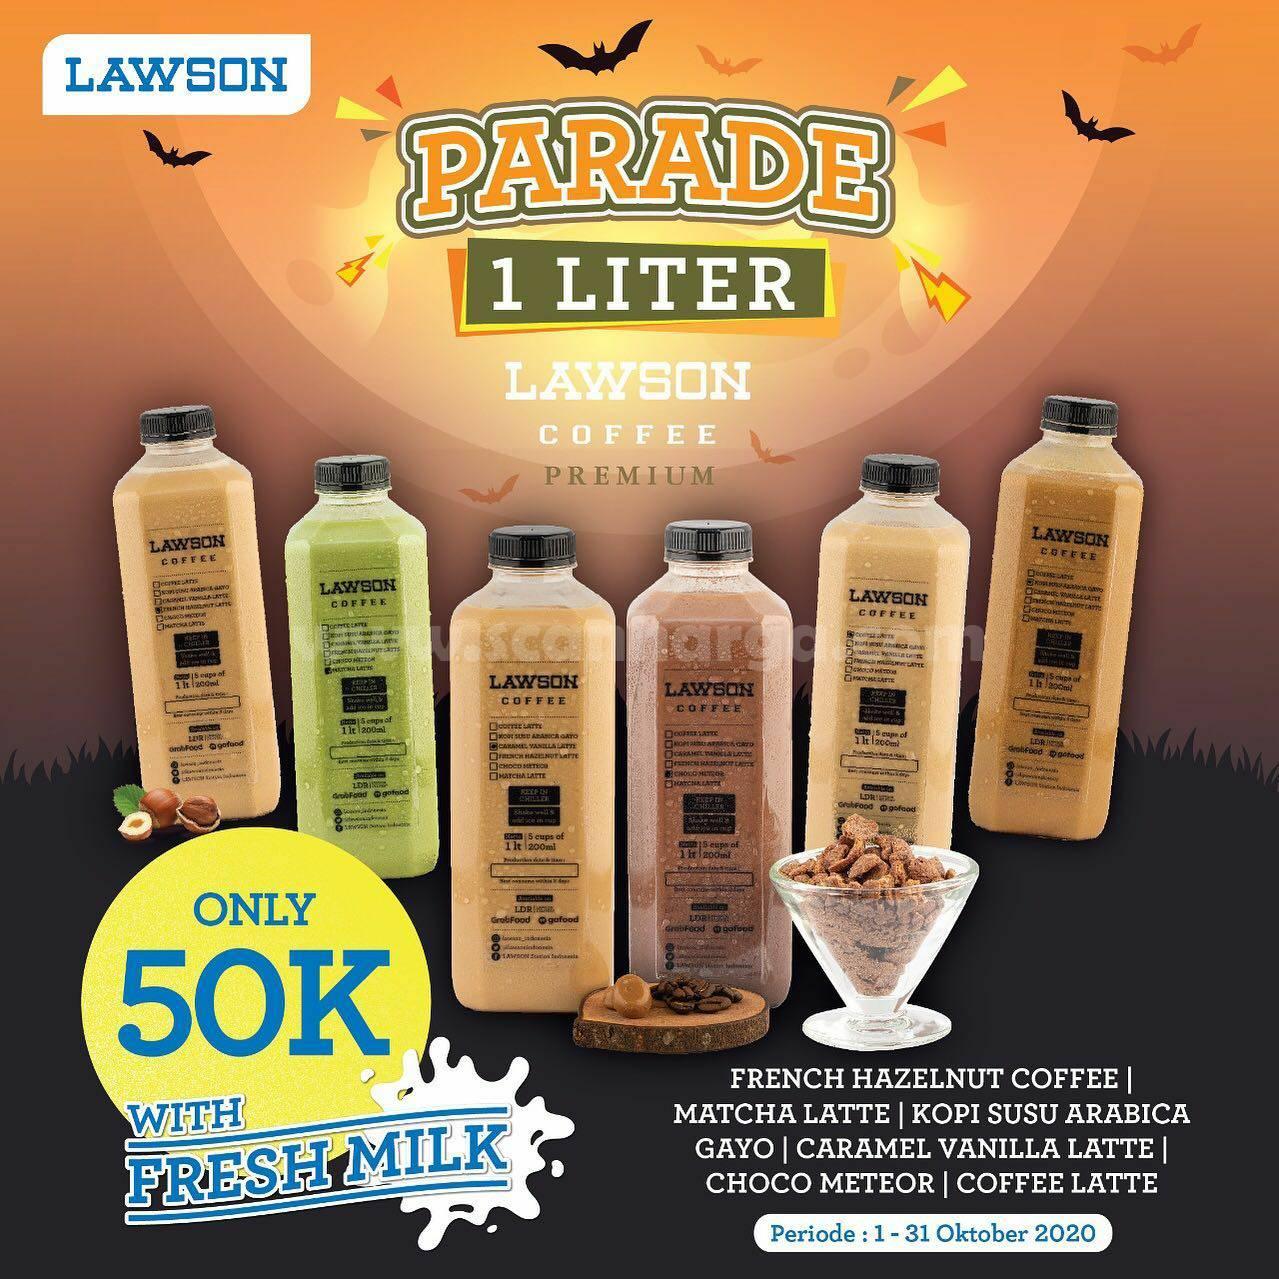 Promo Lawson Parade 1 Liter – Harga Spesial Lawson Coffee 1 liter Cuma Rp. 50.000